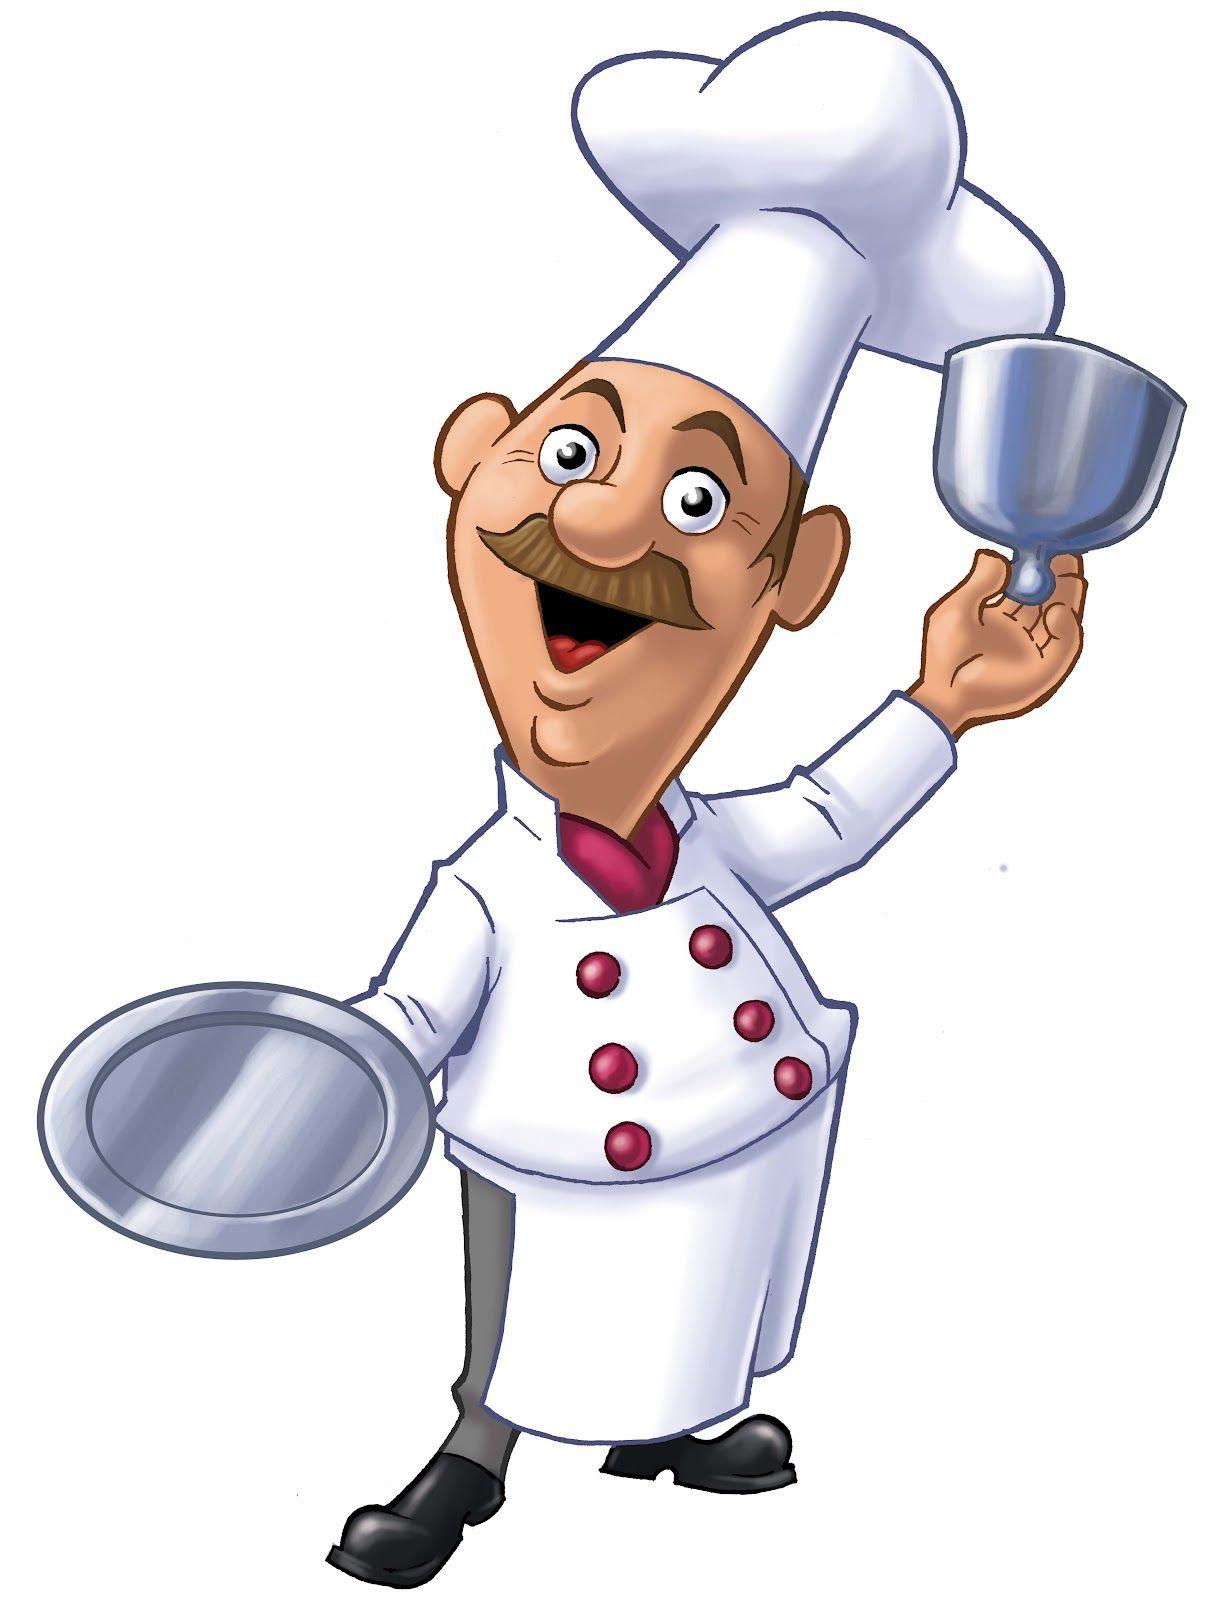 Koch bei der arbeit clipart  koch.jpg (1232×1600) | Koch Küche Applikationen Patches ...